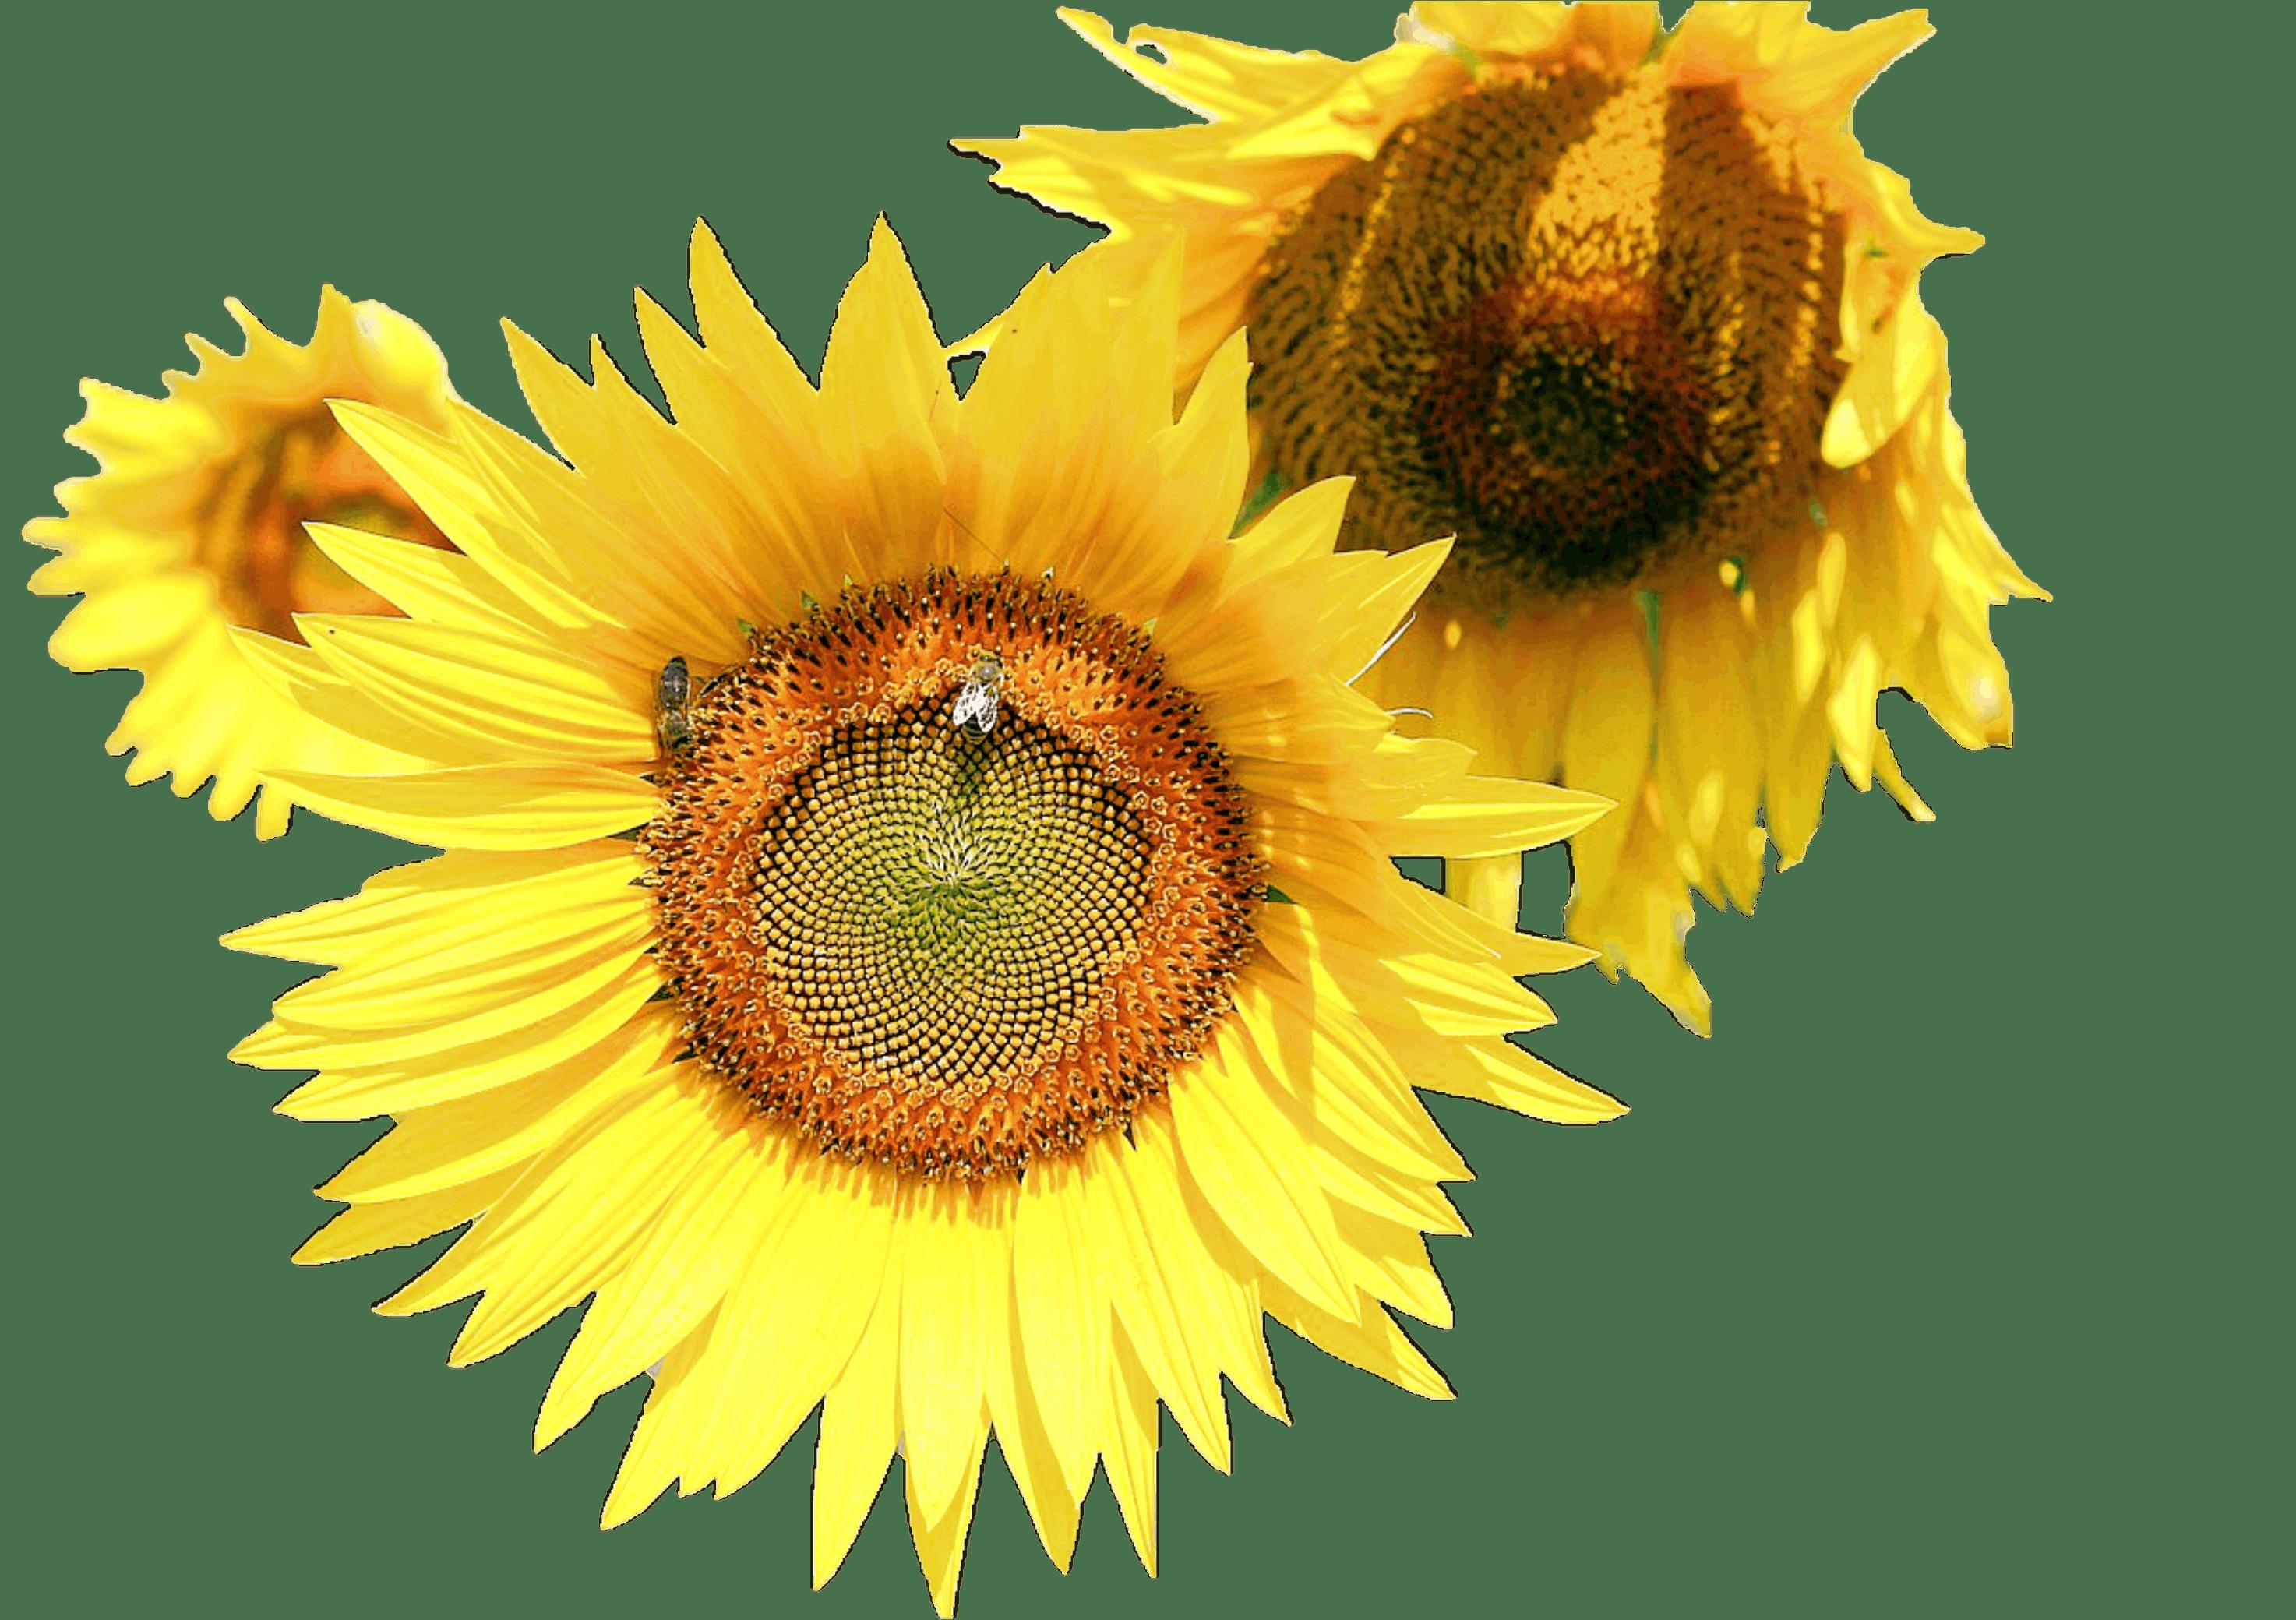 Free stock photo of nature, plant, sunflower, close